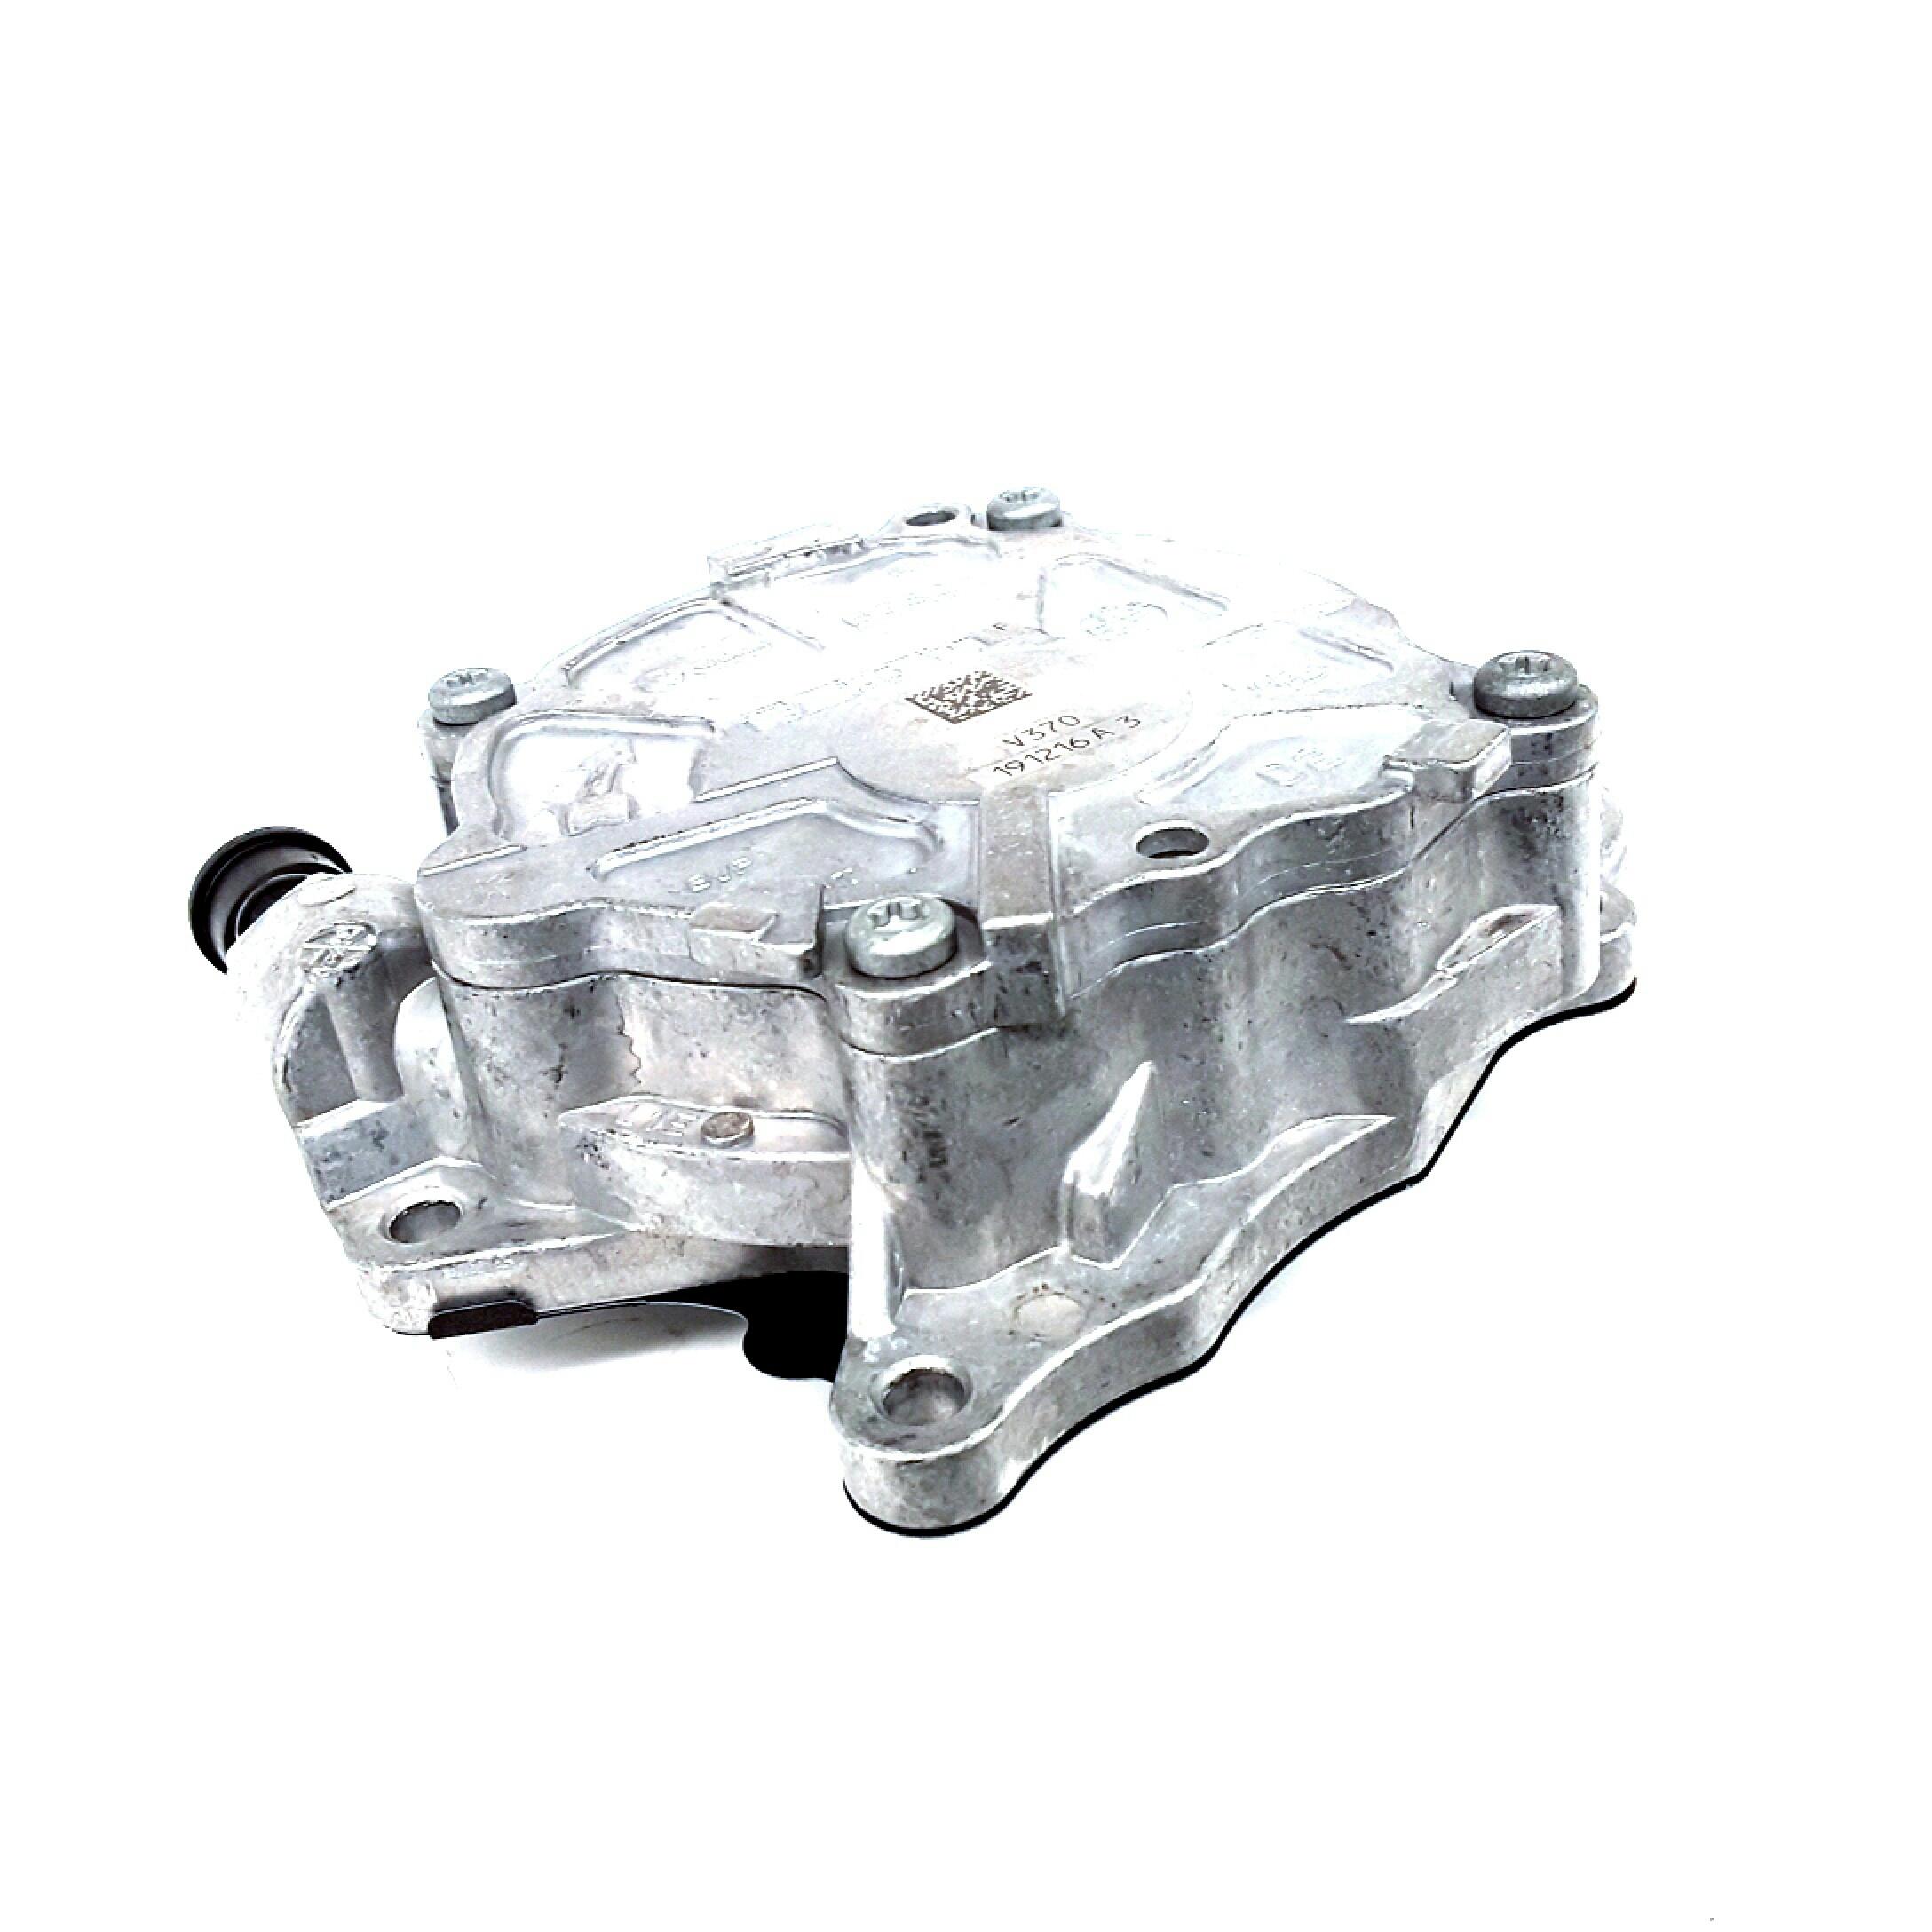 2010 Volkswagen Golf TDI Vacuum Pump. Wagon, Group, Engine